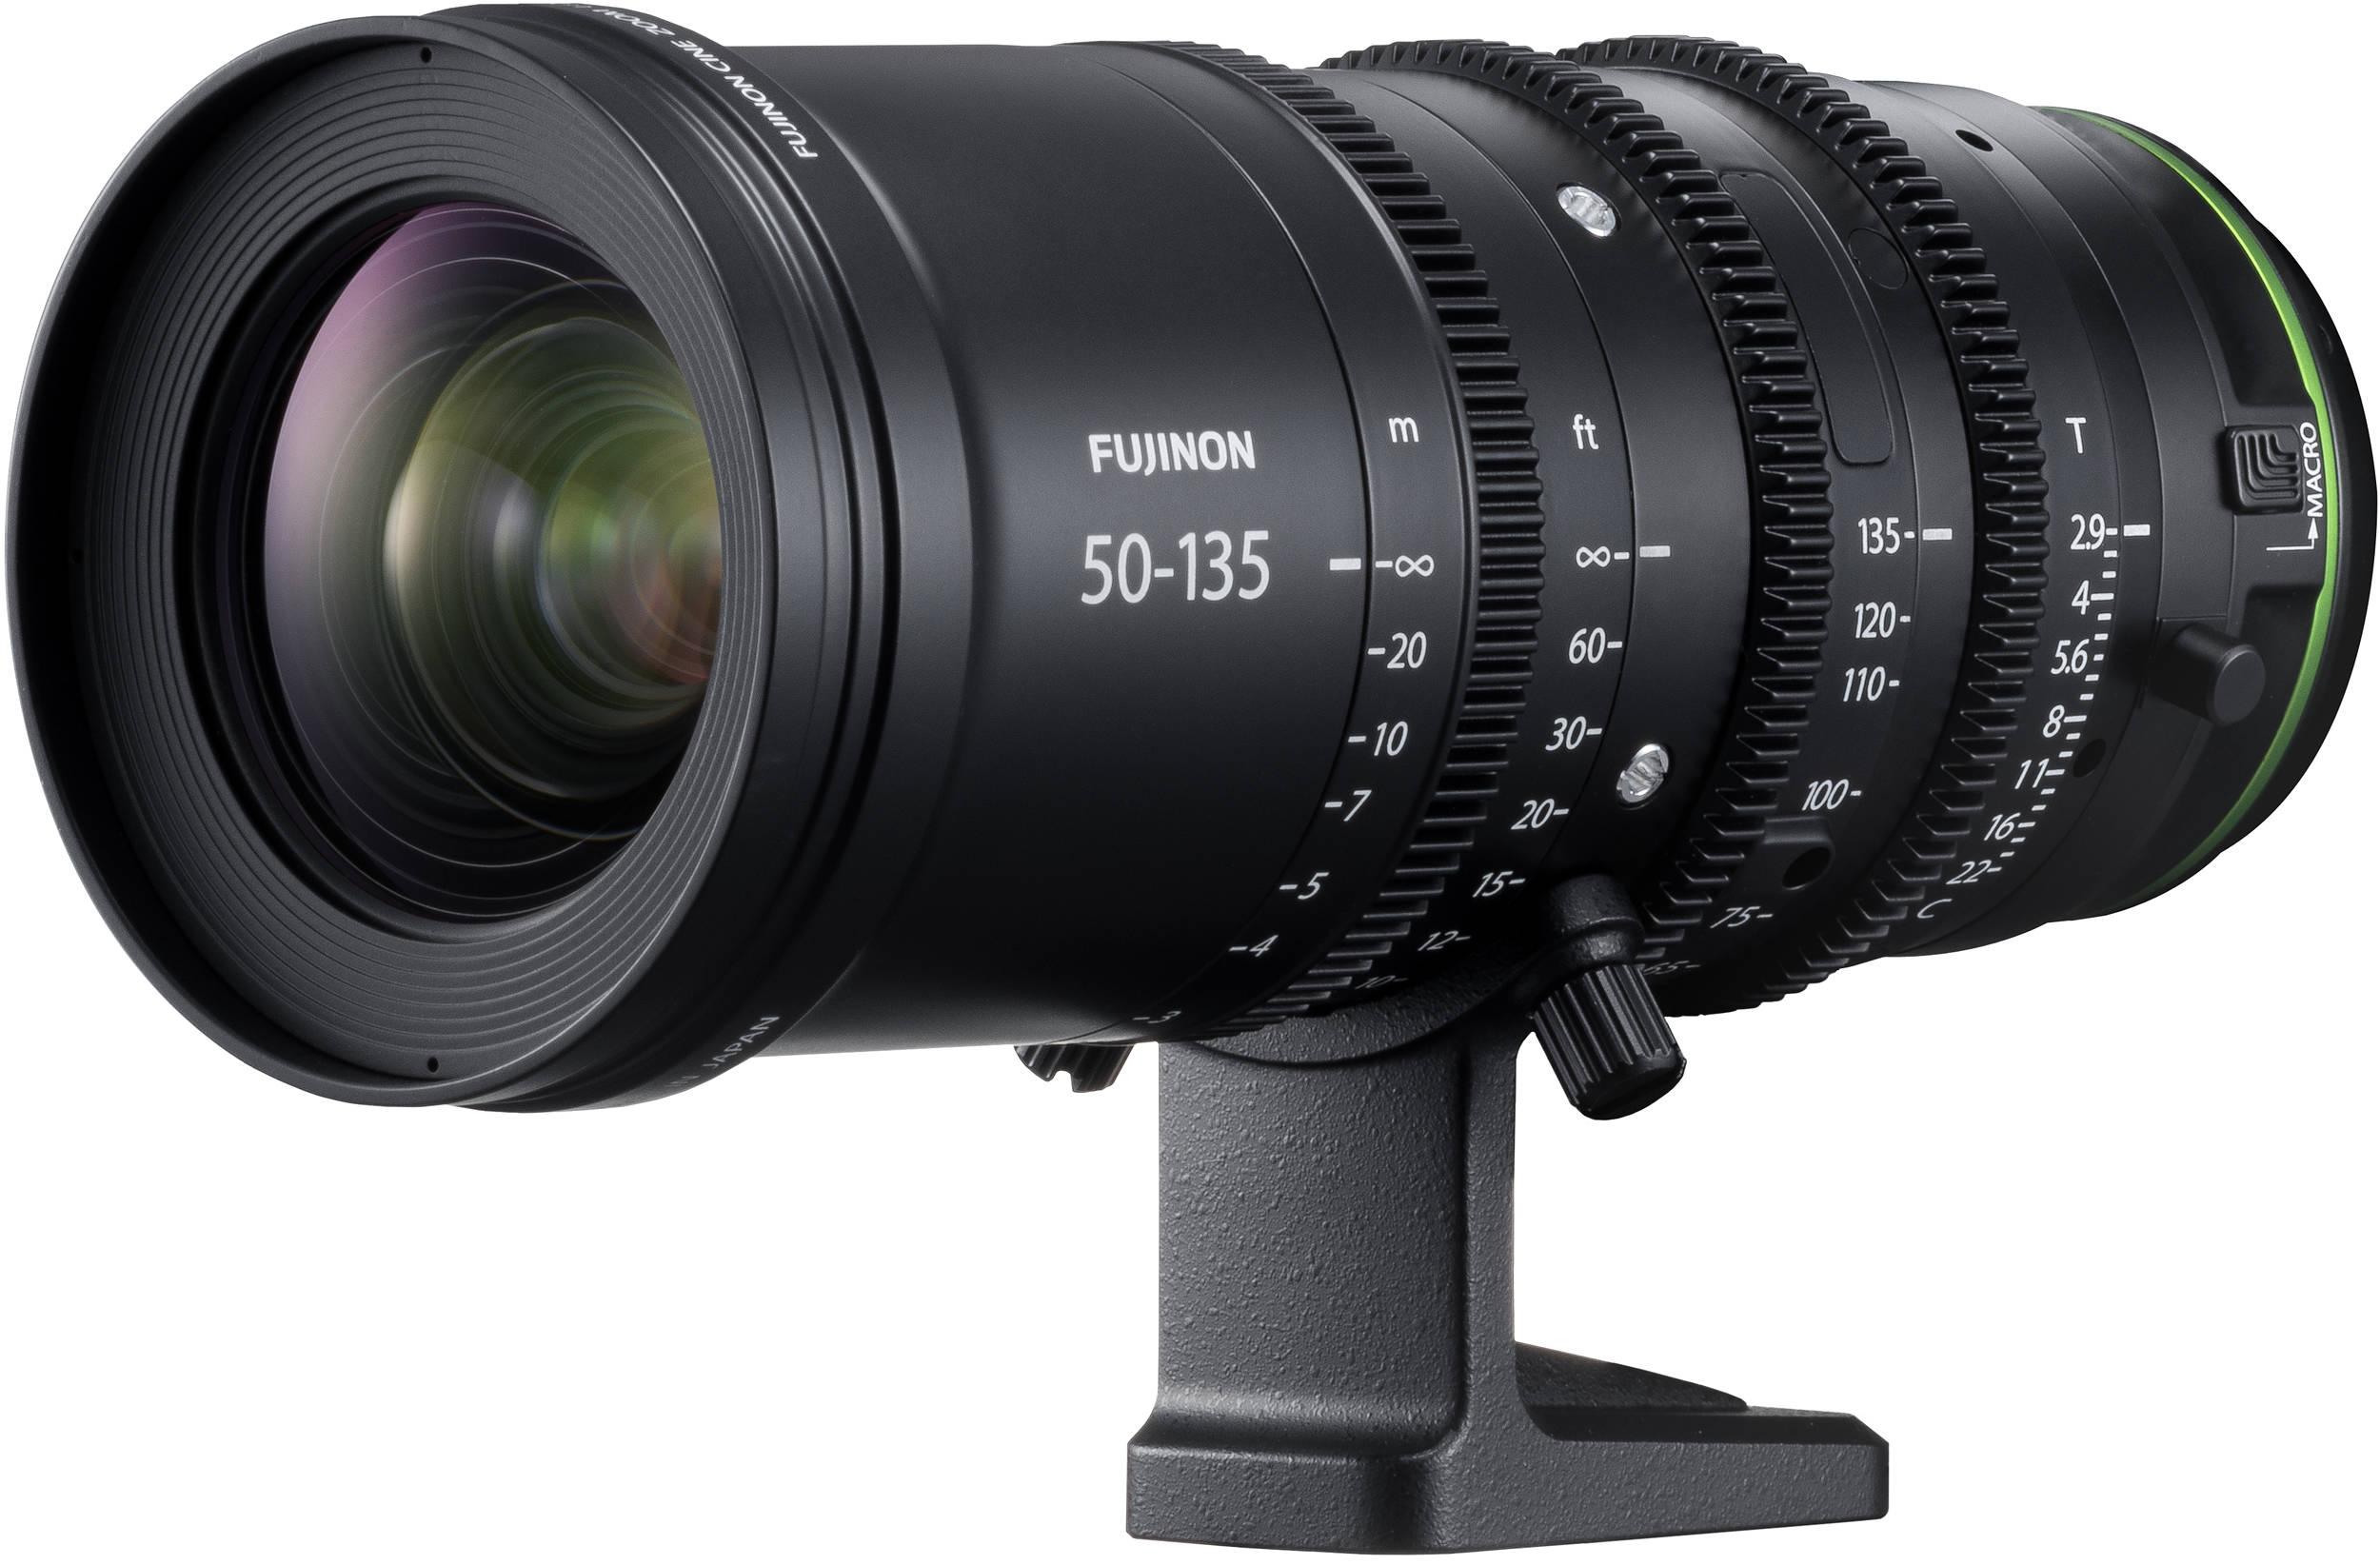 Fujifilm Lenses for Wedding Photographers | B&H Explora